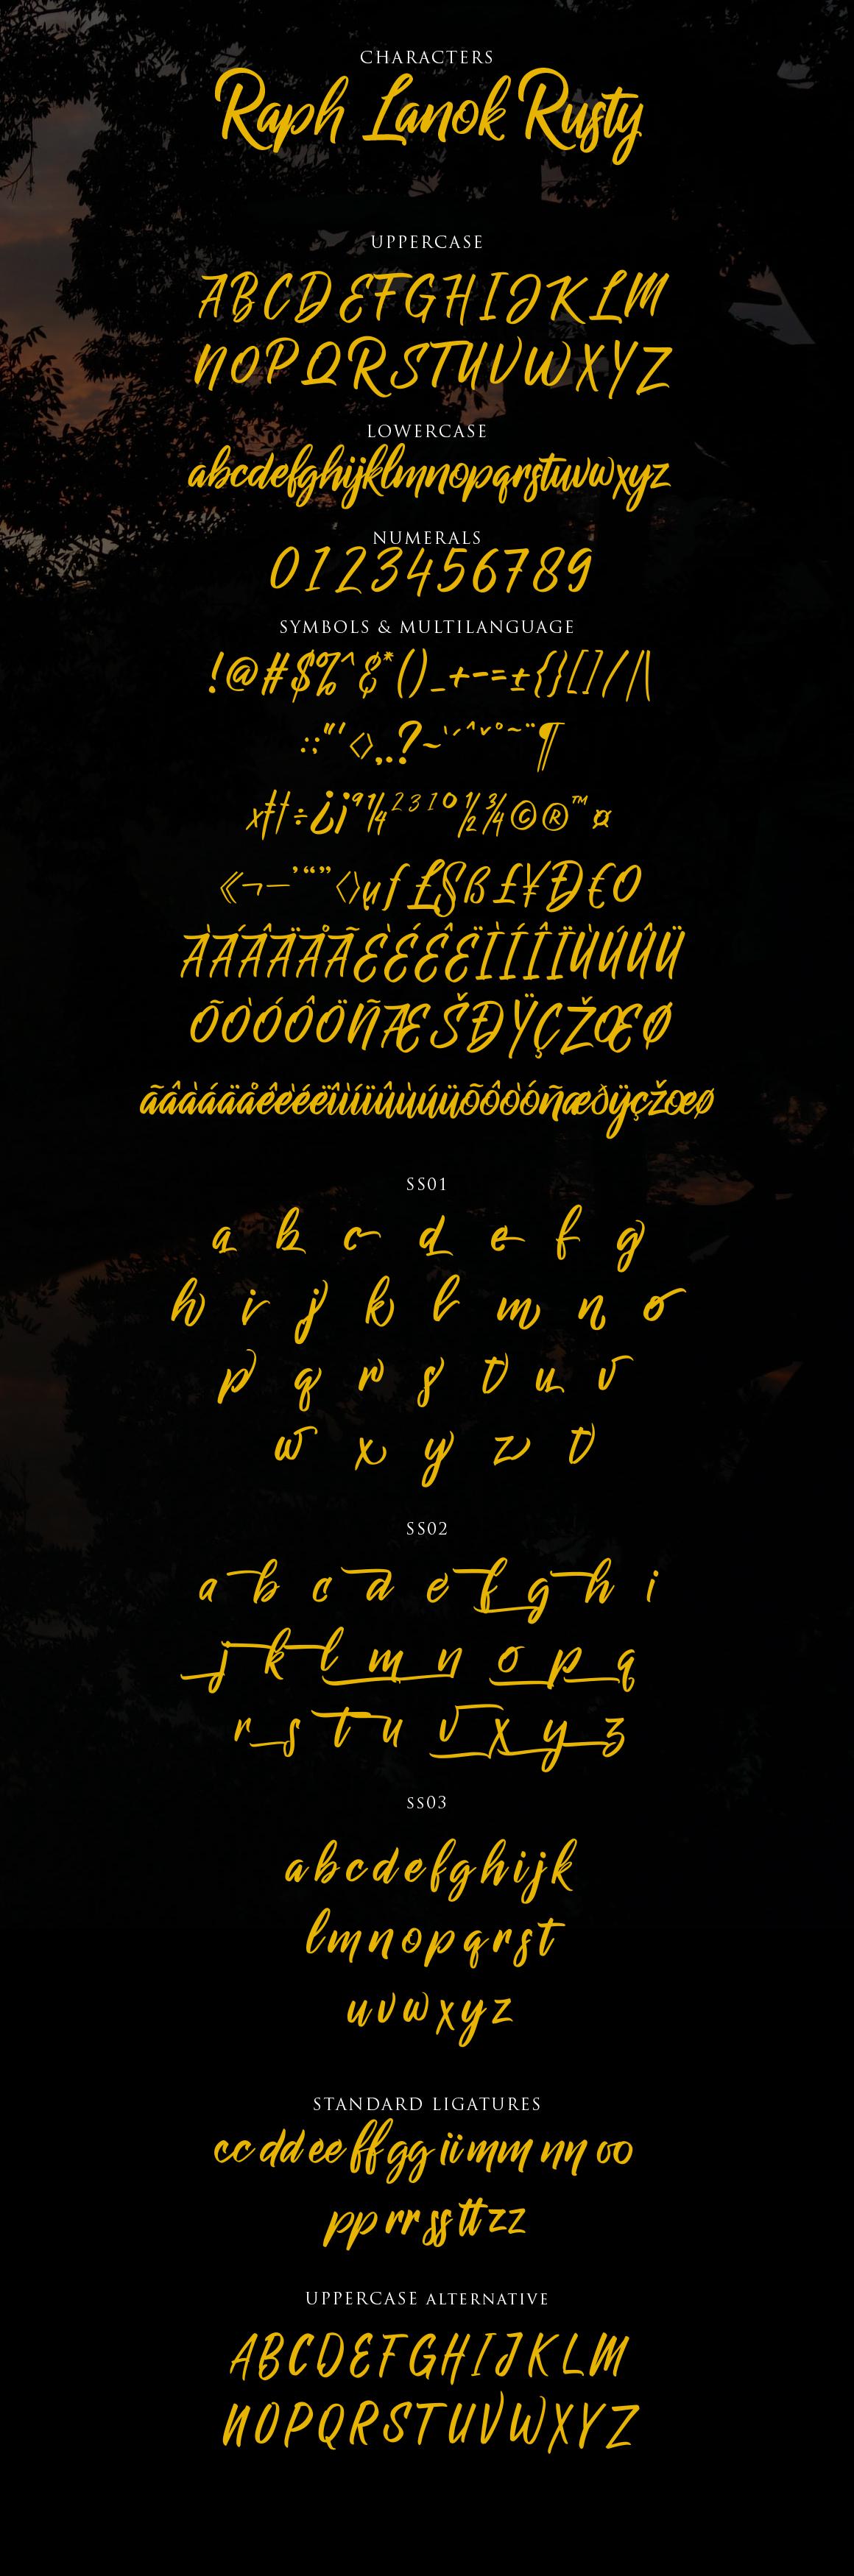 Raph Lanok Typeface example image 11